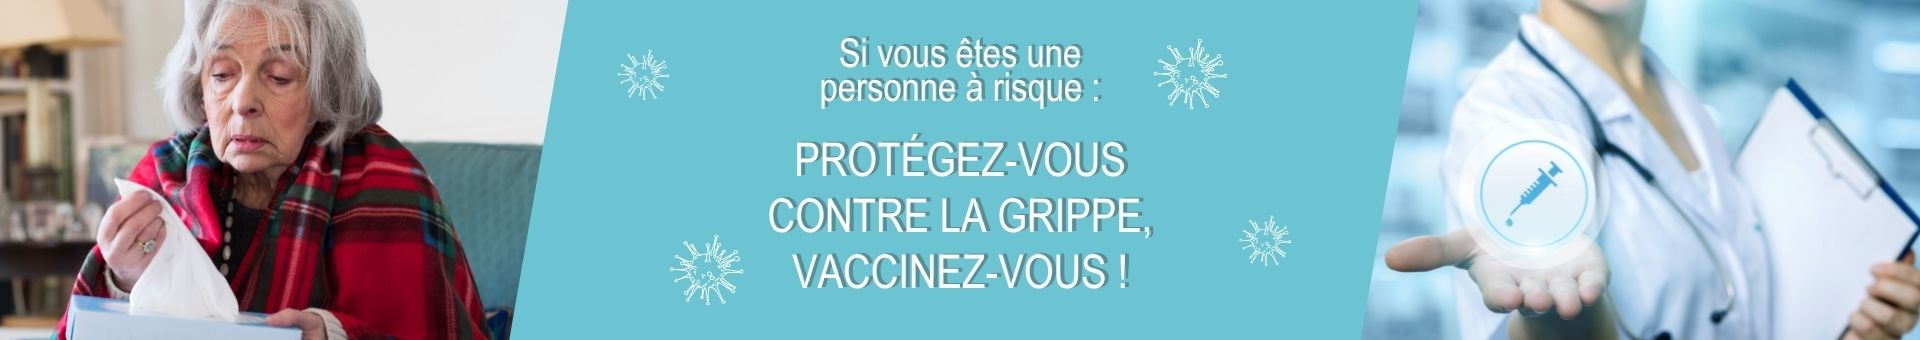 Pharmacie Guichard,Périgueux